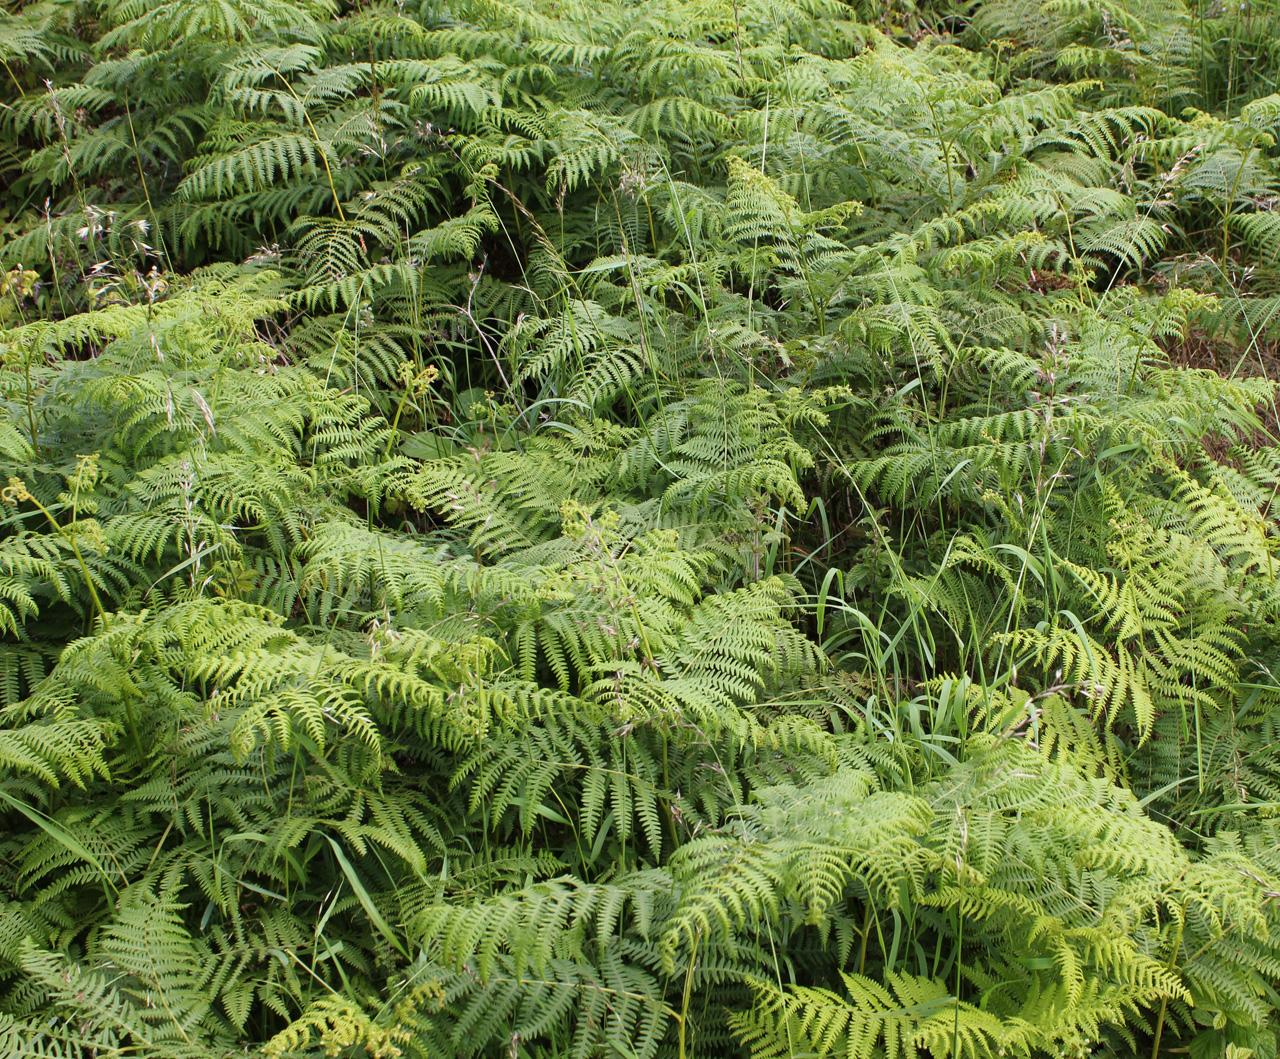 Fern Landscape _ laura phelps rogers - floral ideas1.jpg